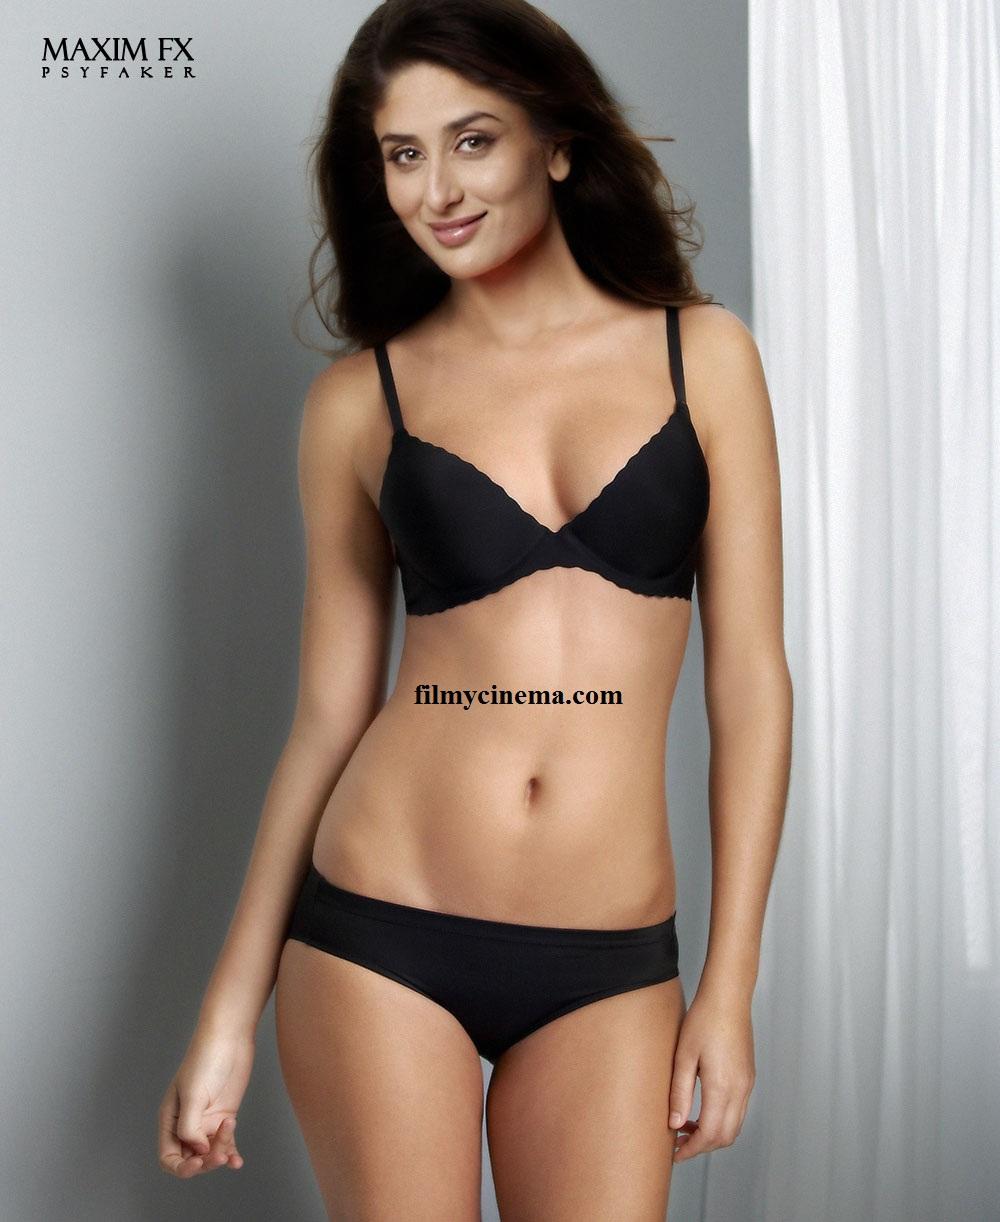 Kareena Kapoor bikini model: 2chb.coresv.com/++Kareena+Kapoor+bikini+model/pic3.html